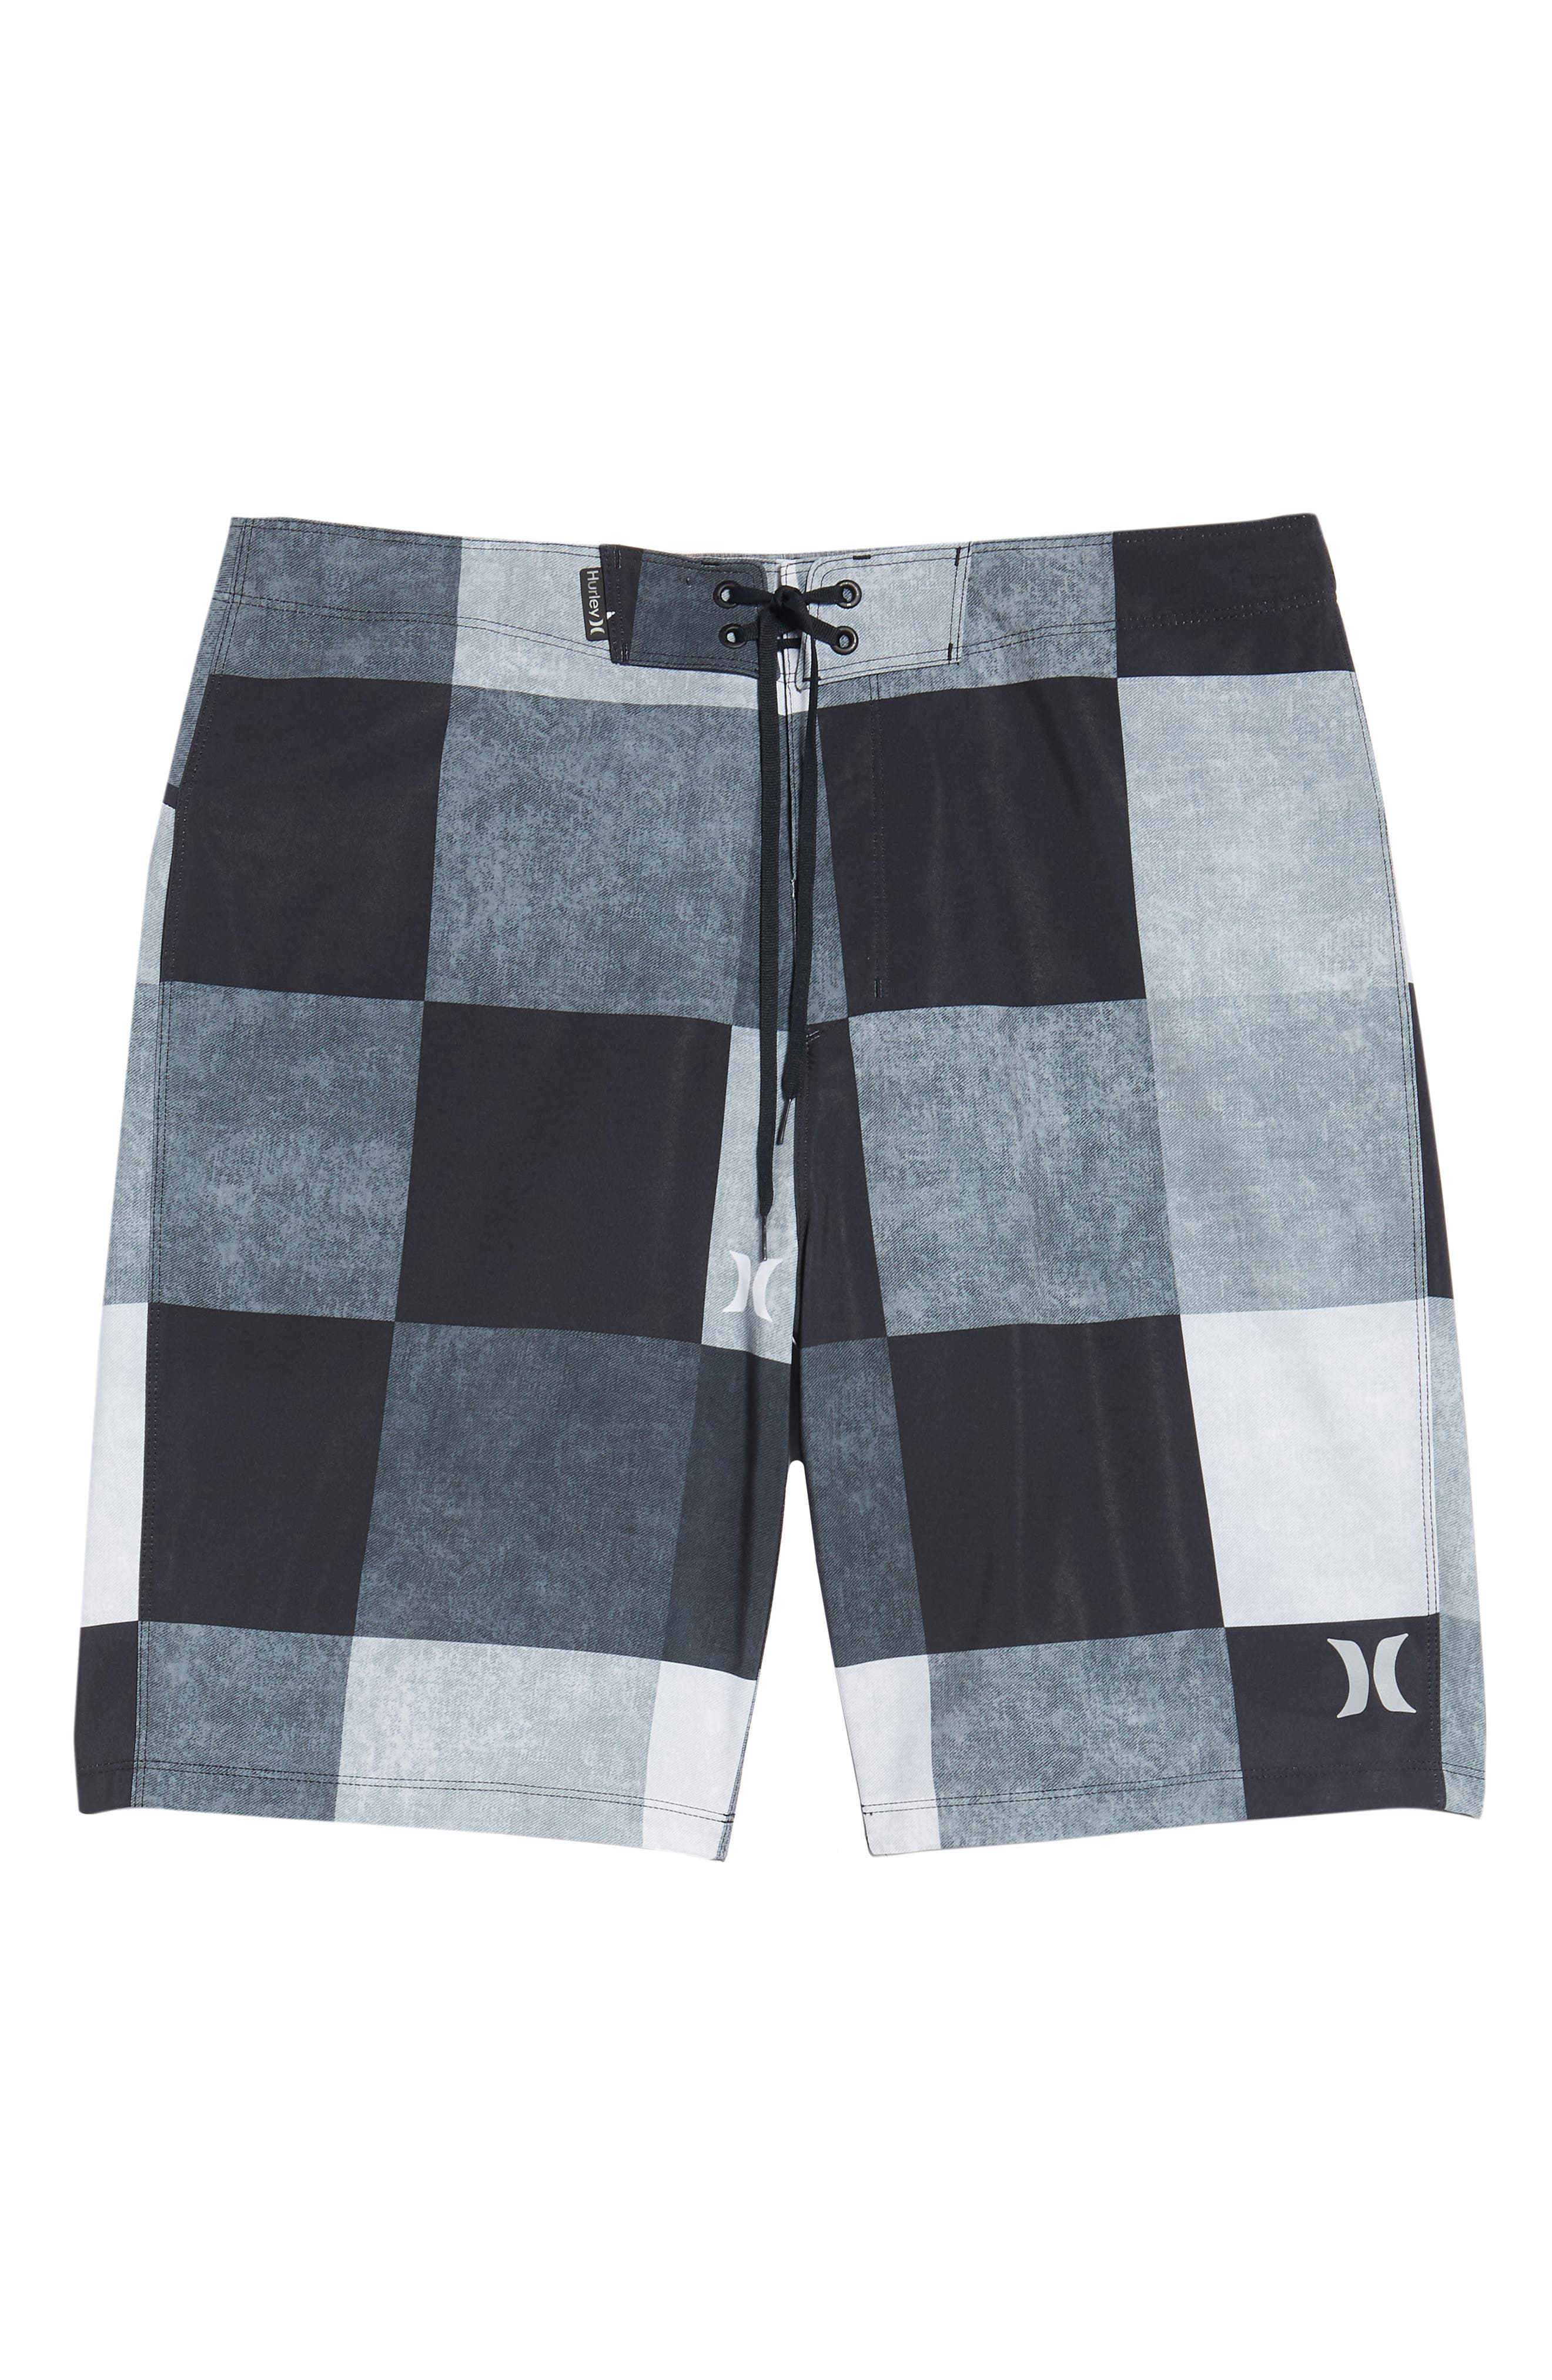 Phantom Kingsroad Board Shorts,                             Alternate thumbnail 6, color,                             BLACK